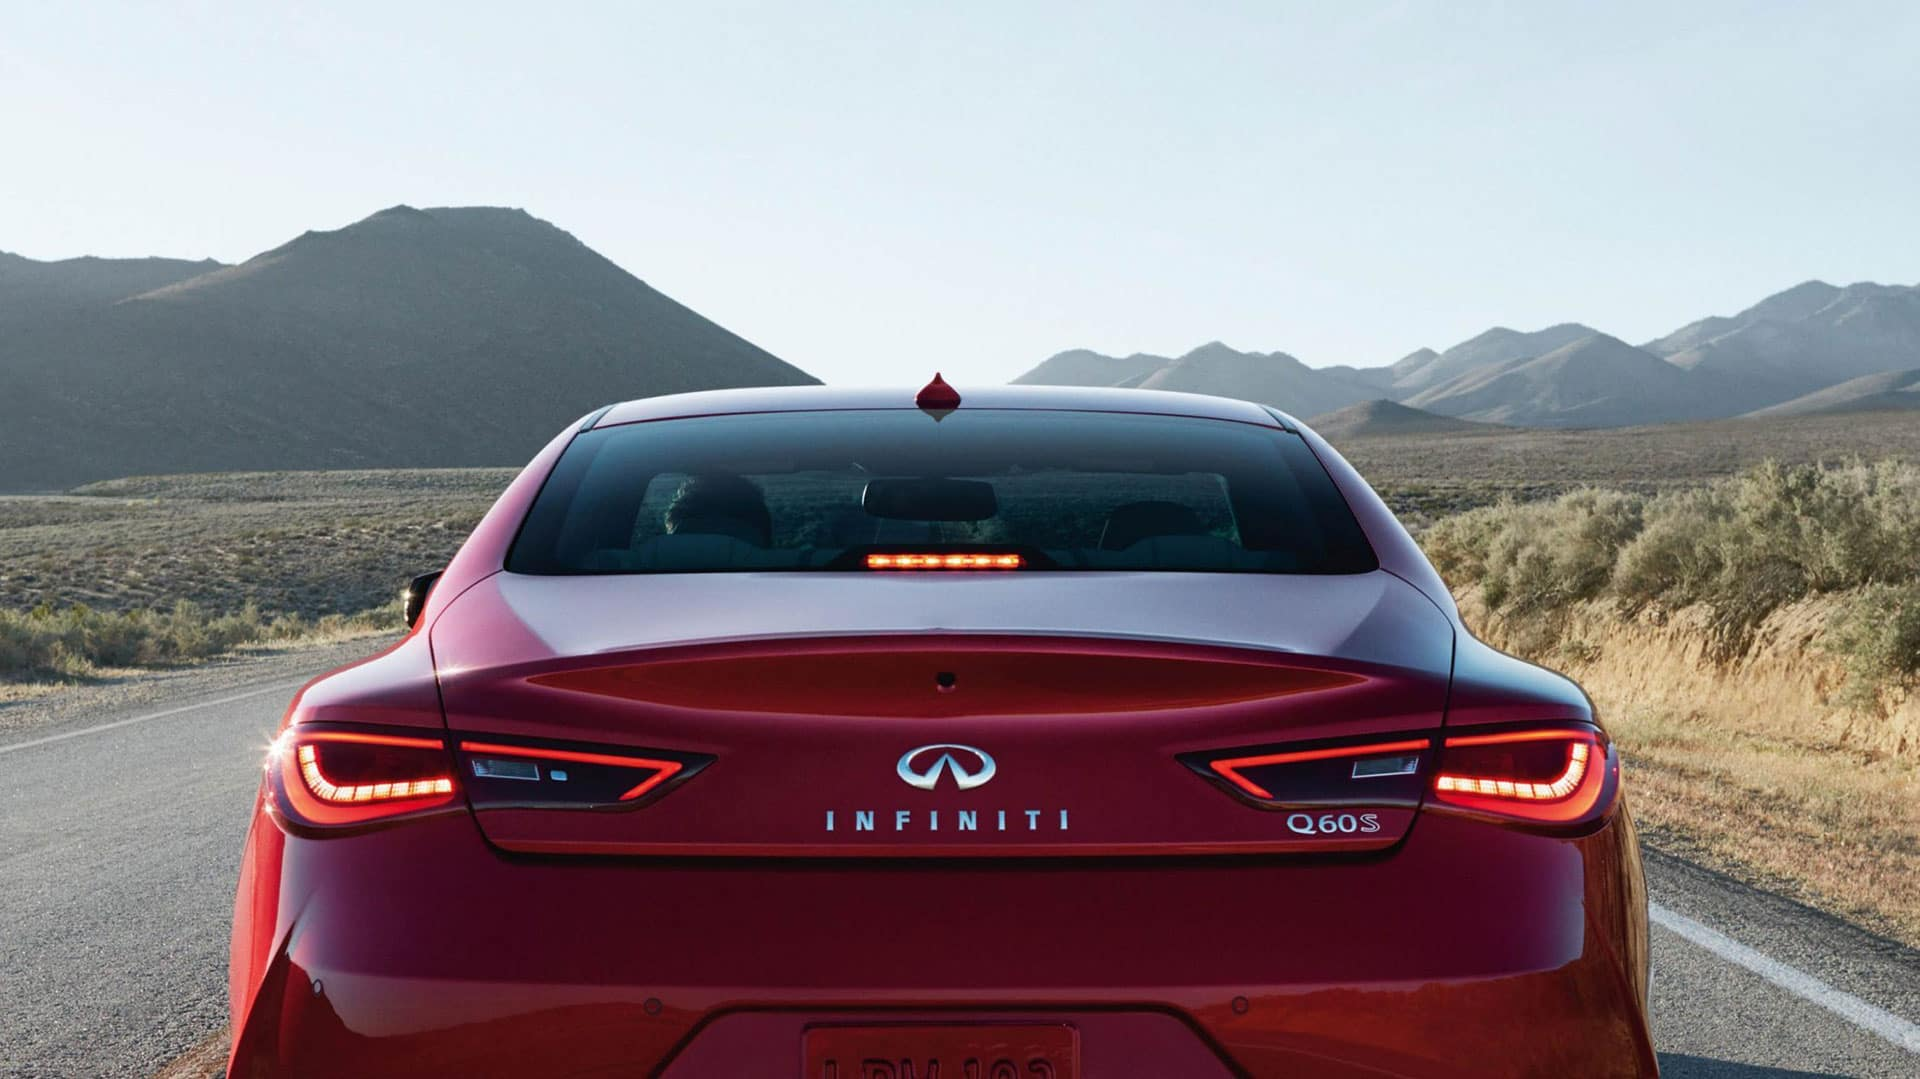 2019-infiniti-q60-coupe-high-rear